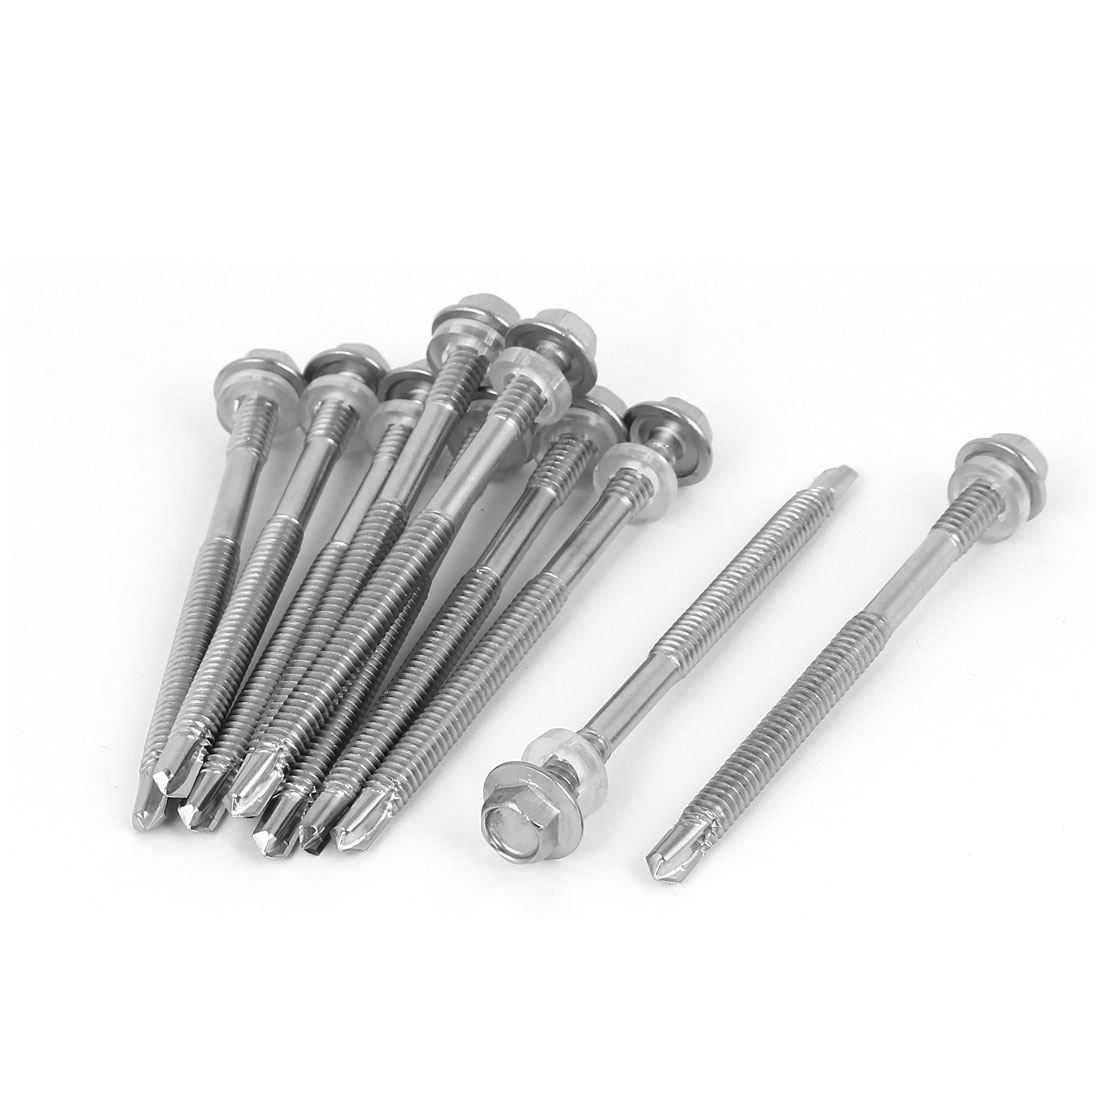 M5.5 x 75mm Thread 410 Stainless Steel Self Drilling Tek Screw w Washer 10 Pcs